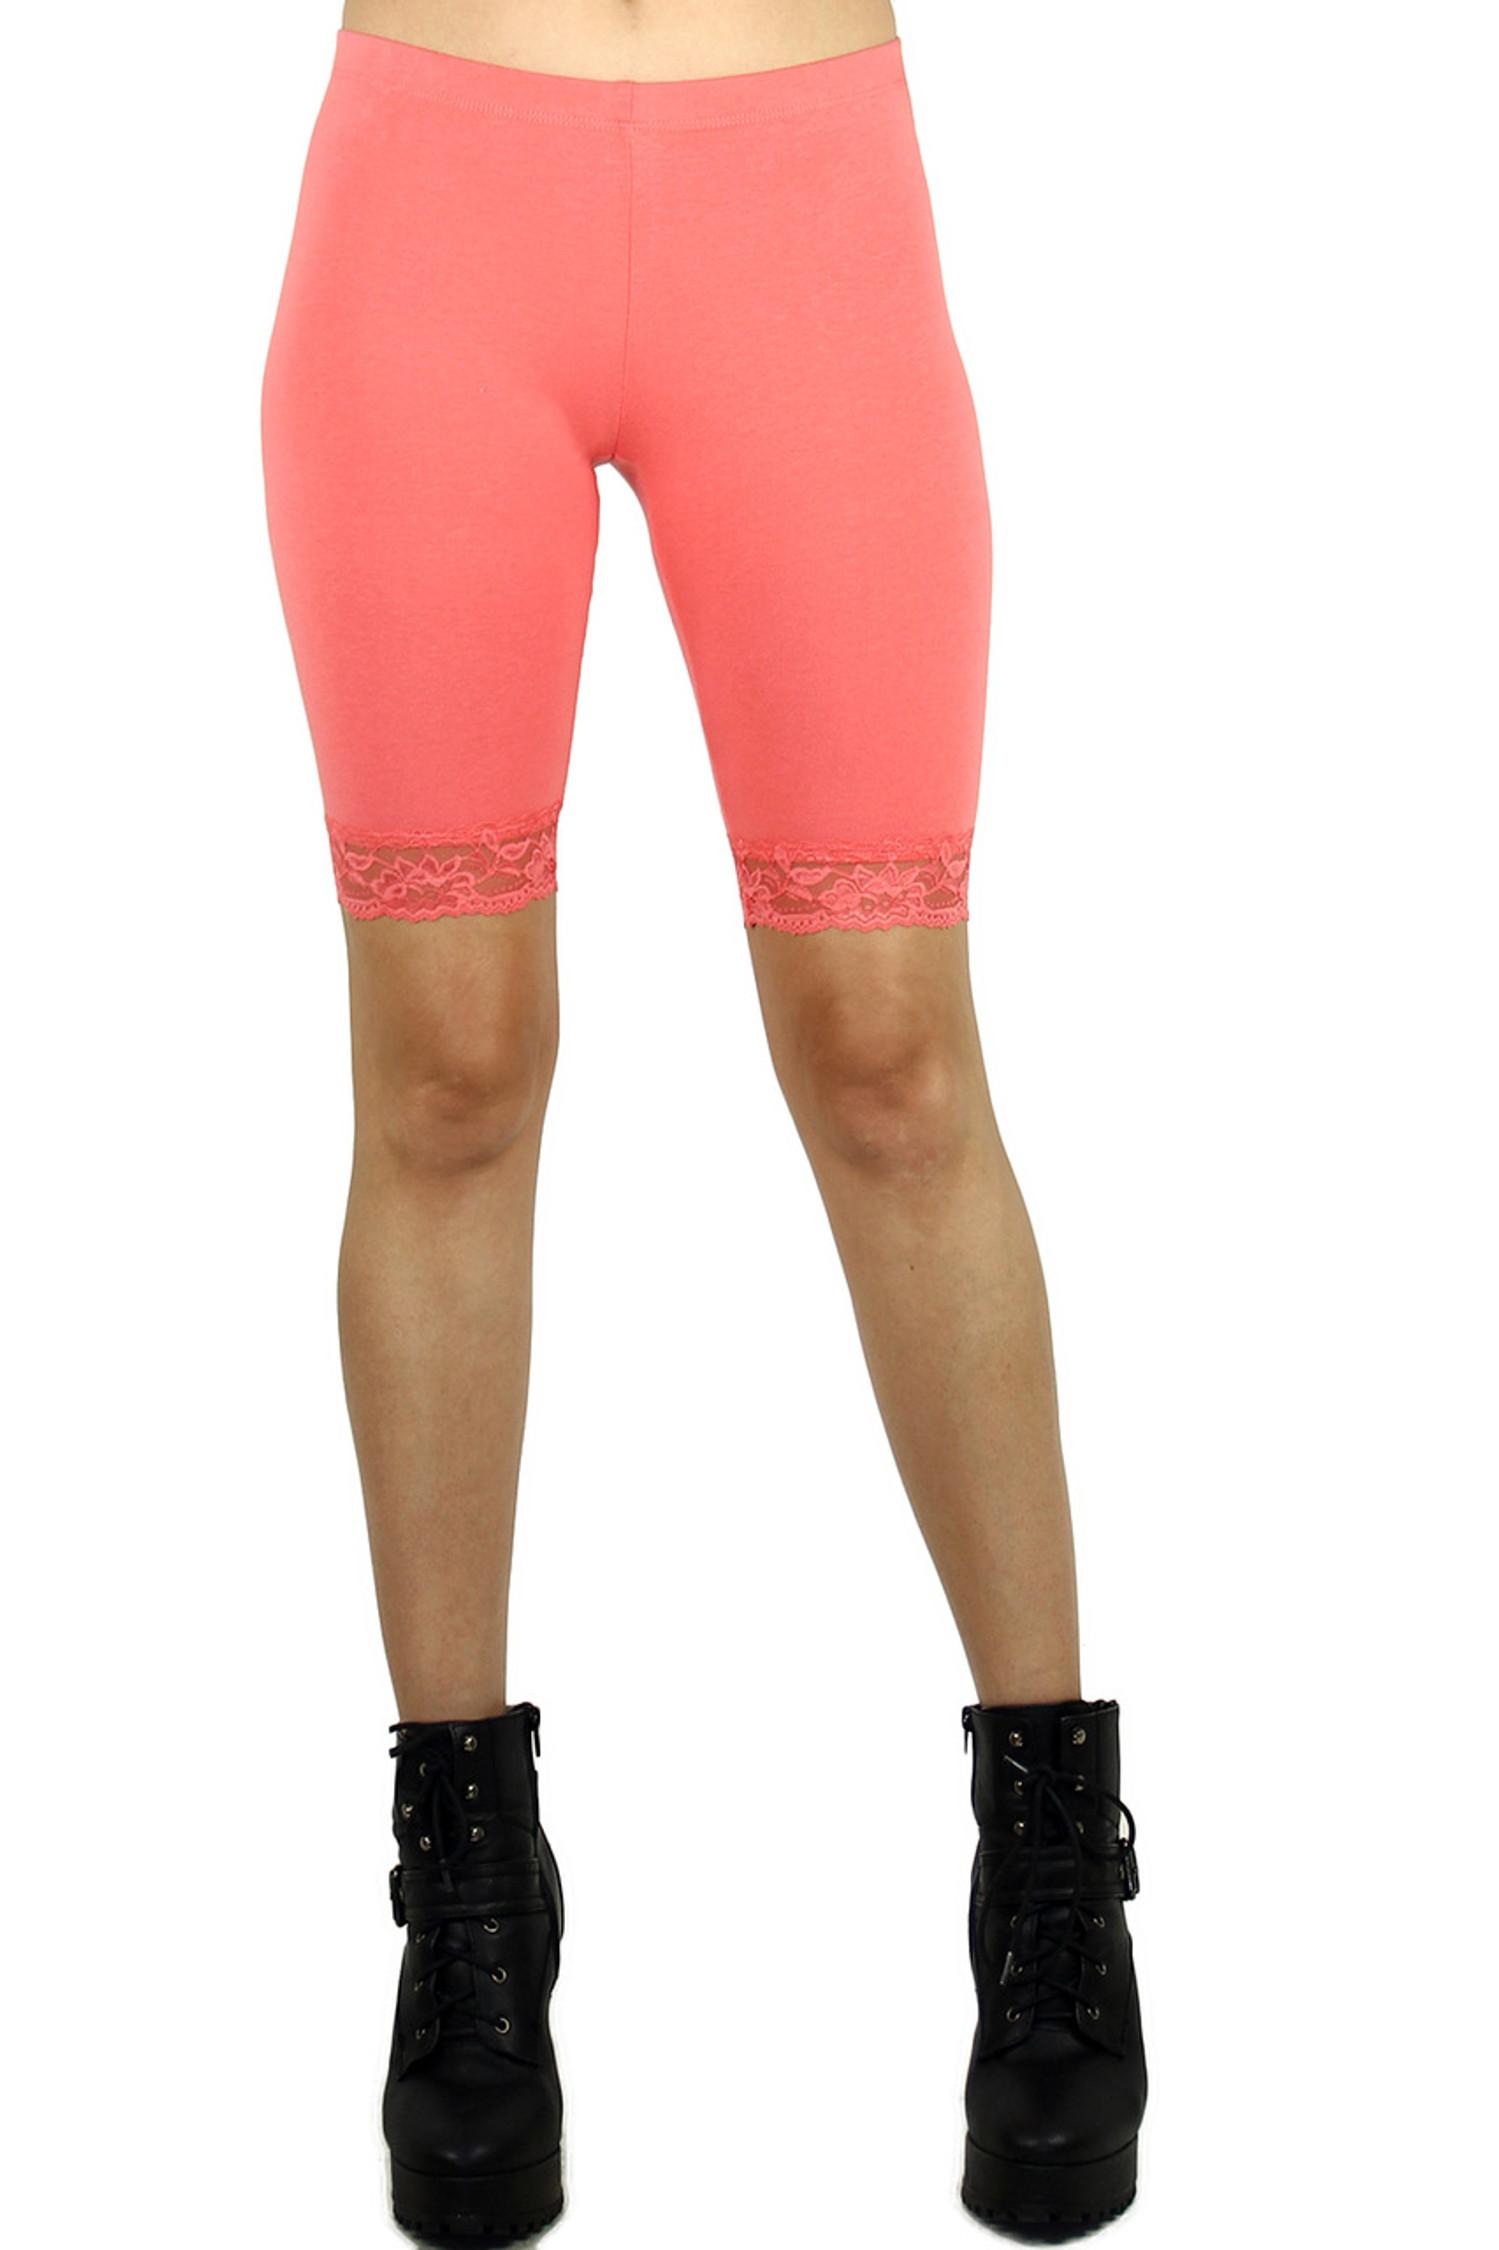 USA Cotton Lace Thigh Shorts